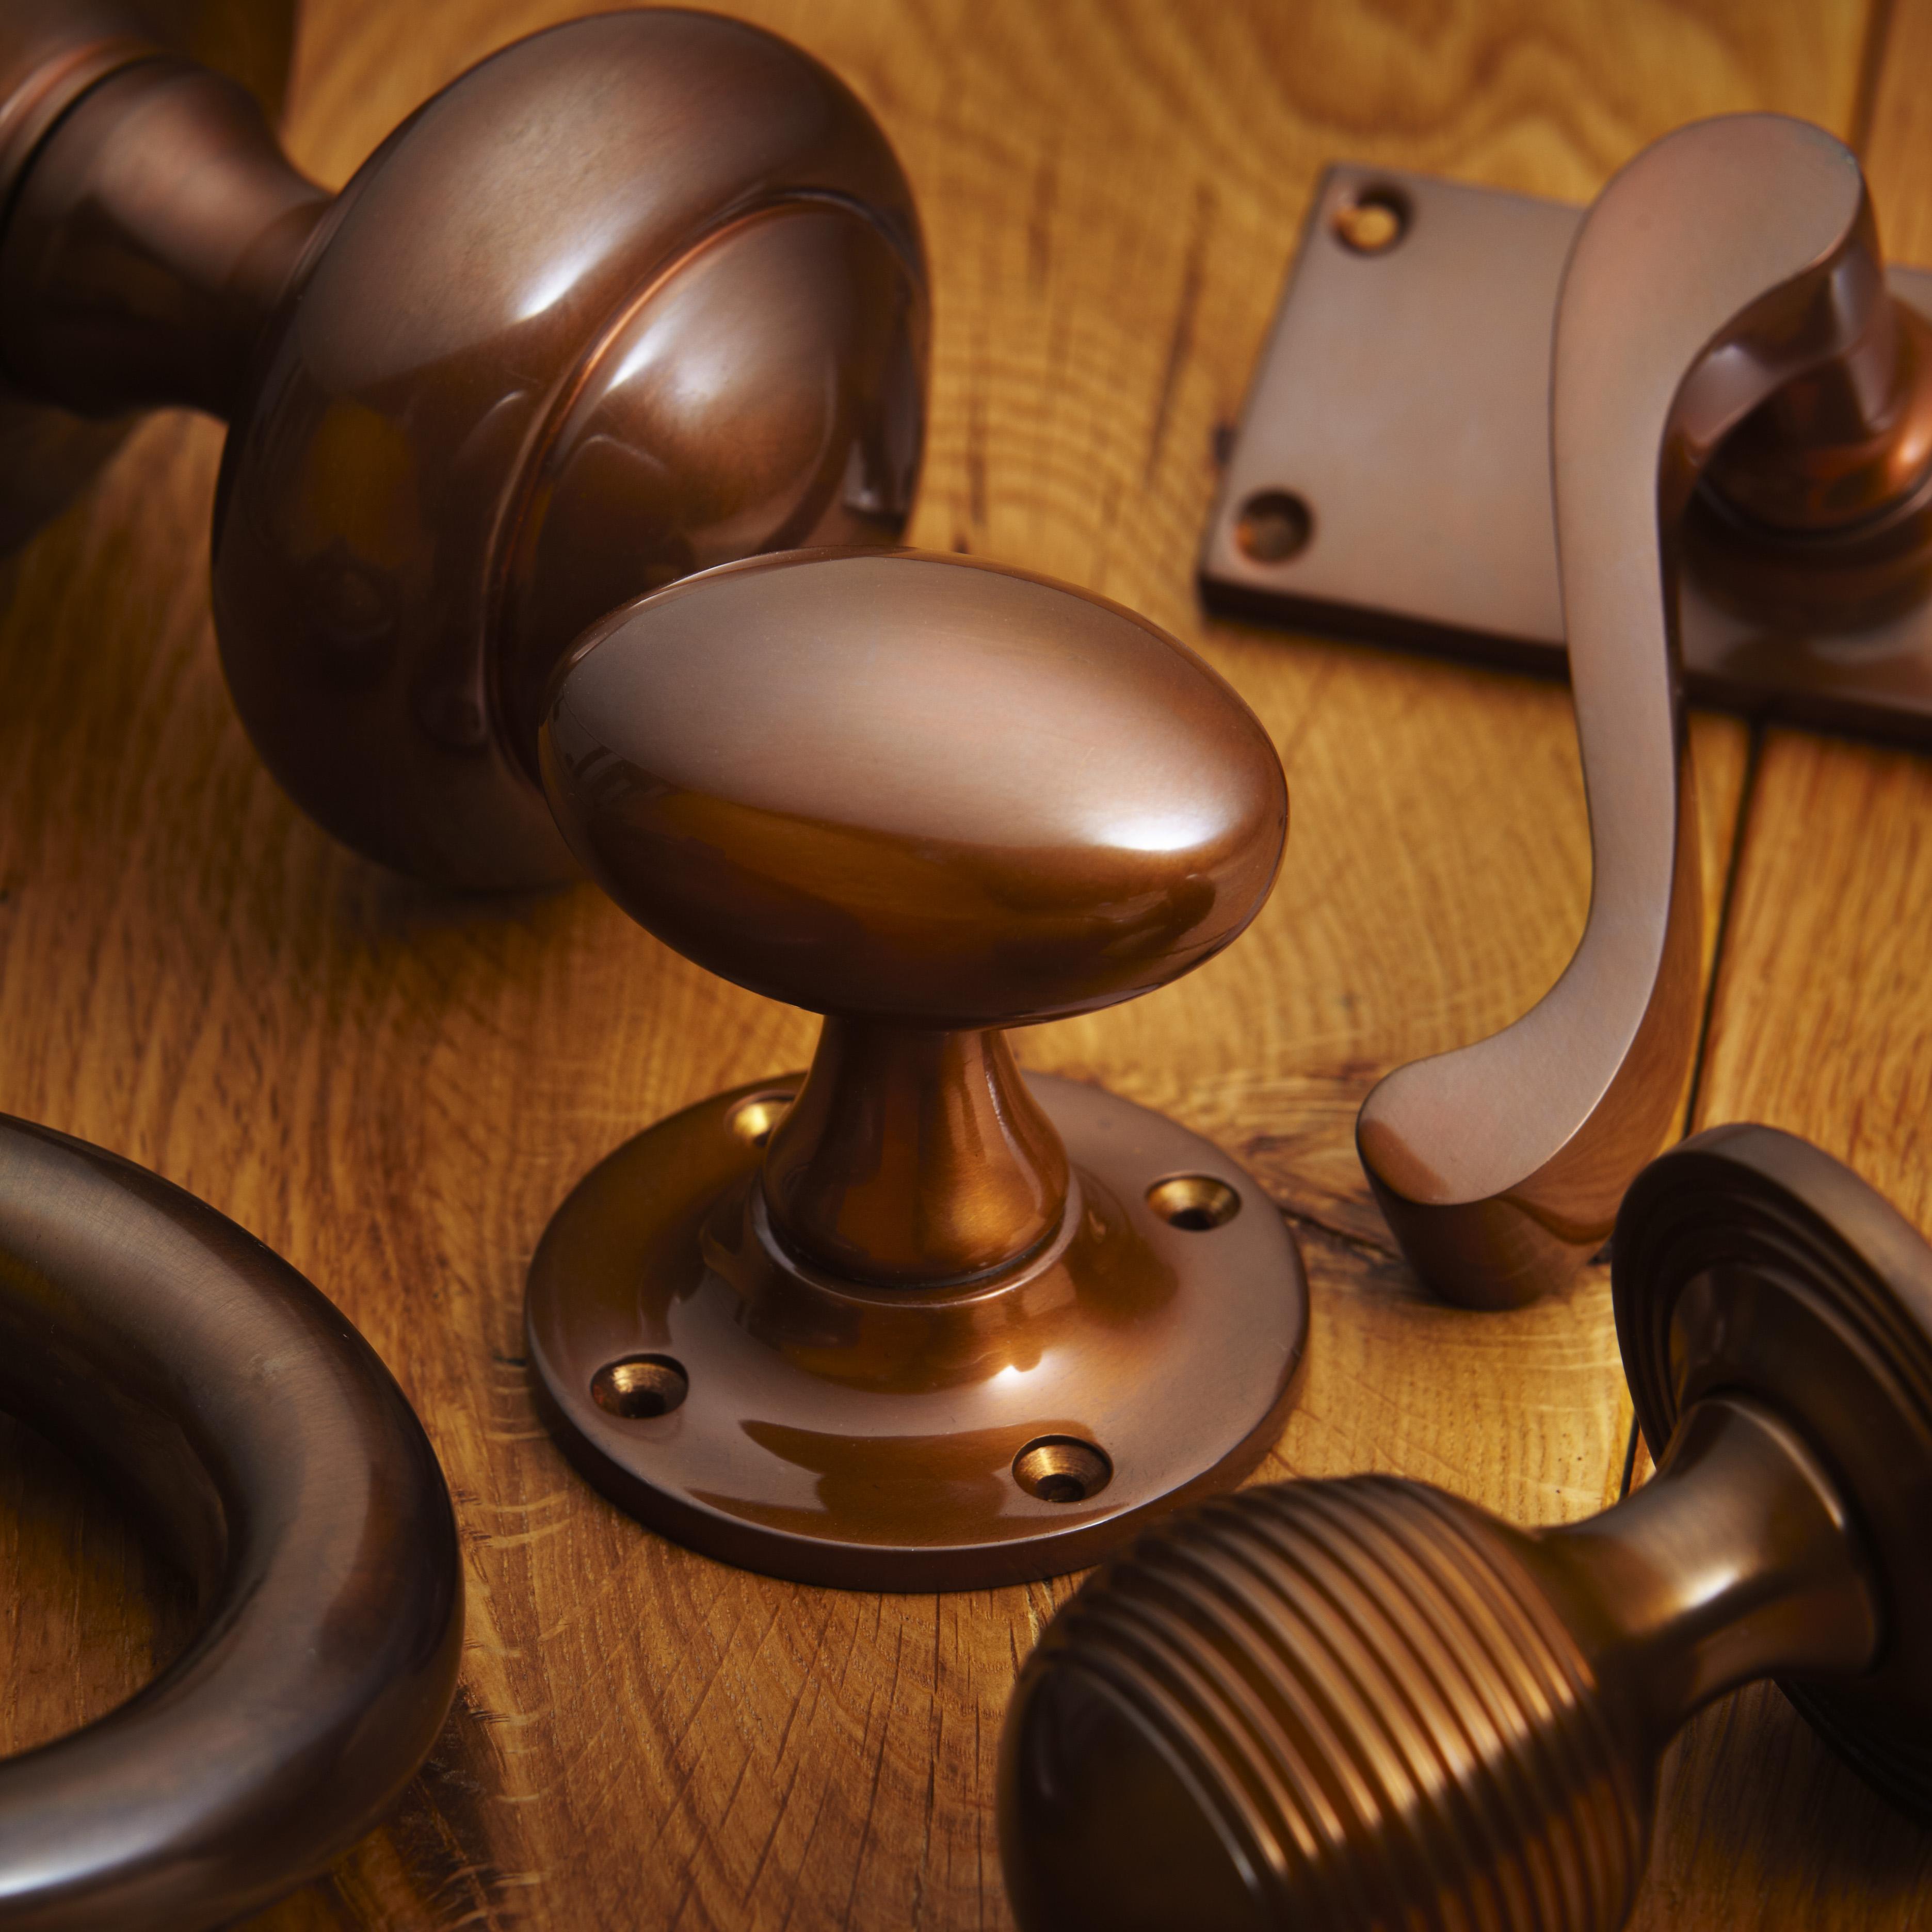 croft hardware imitation bronze metal antique